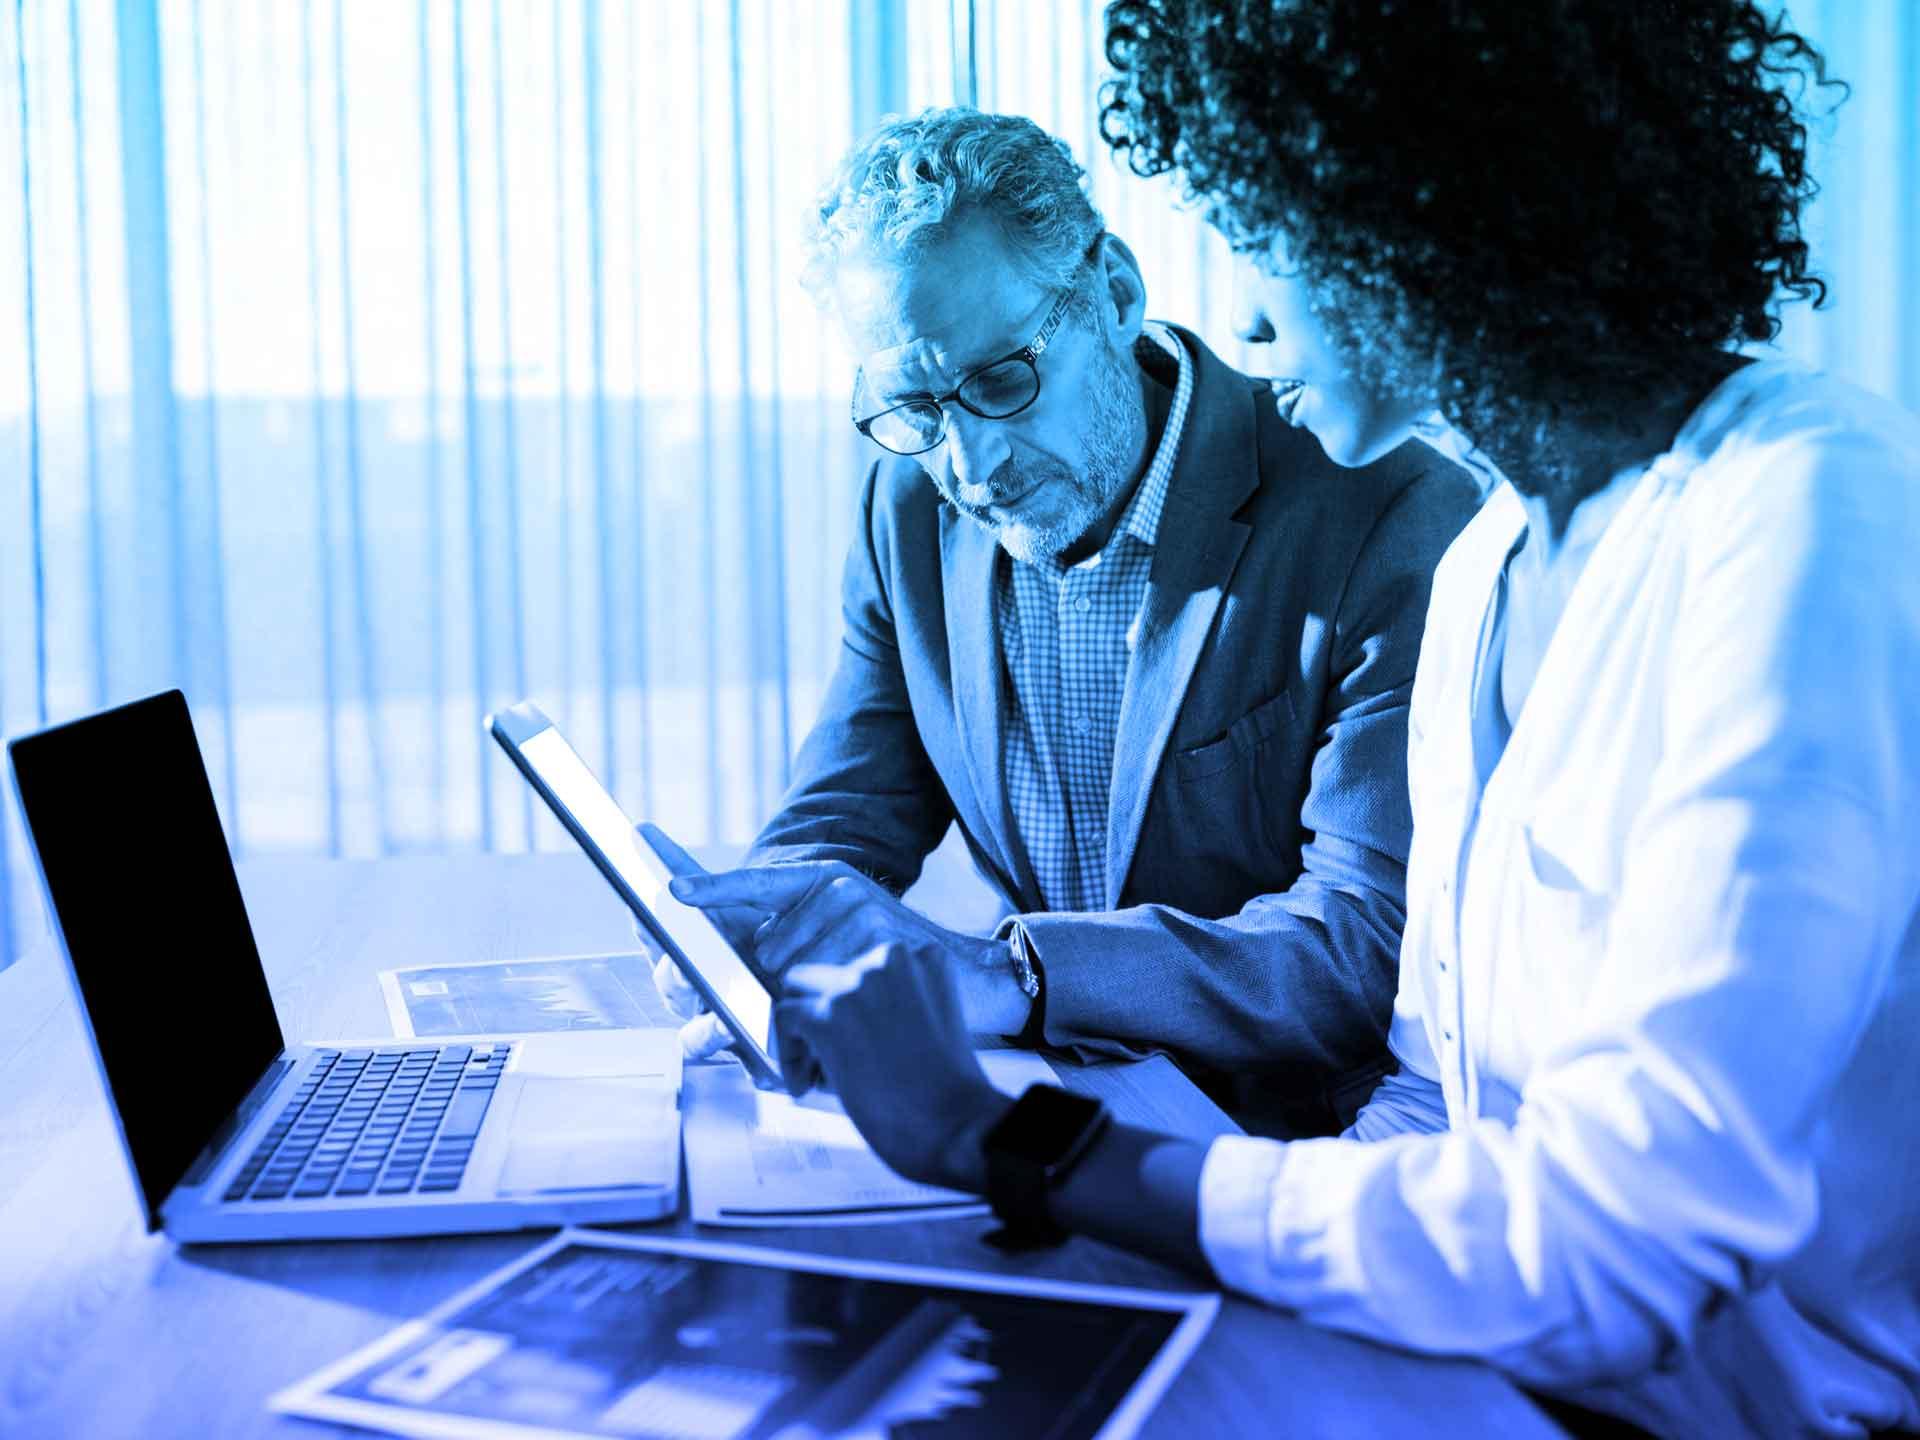 Betere klantenservice met Microsoft Dynamics 365 Business Central